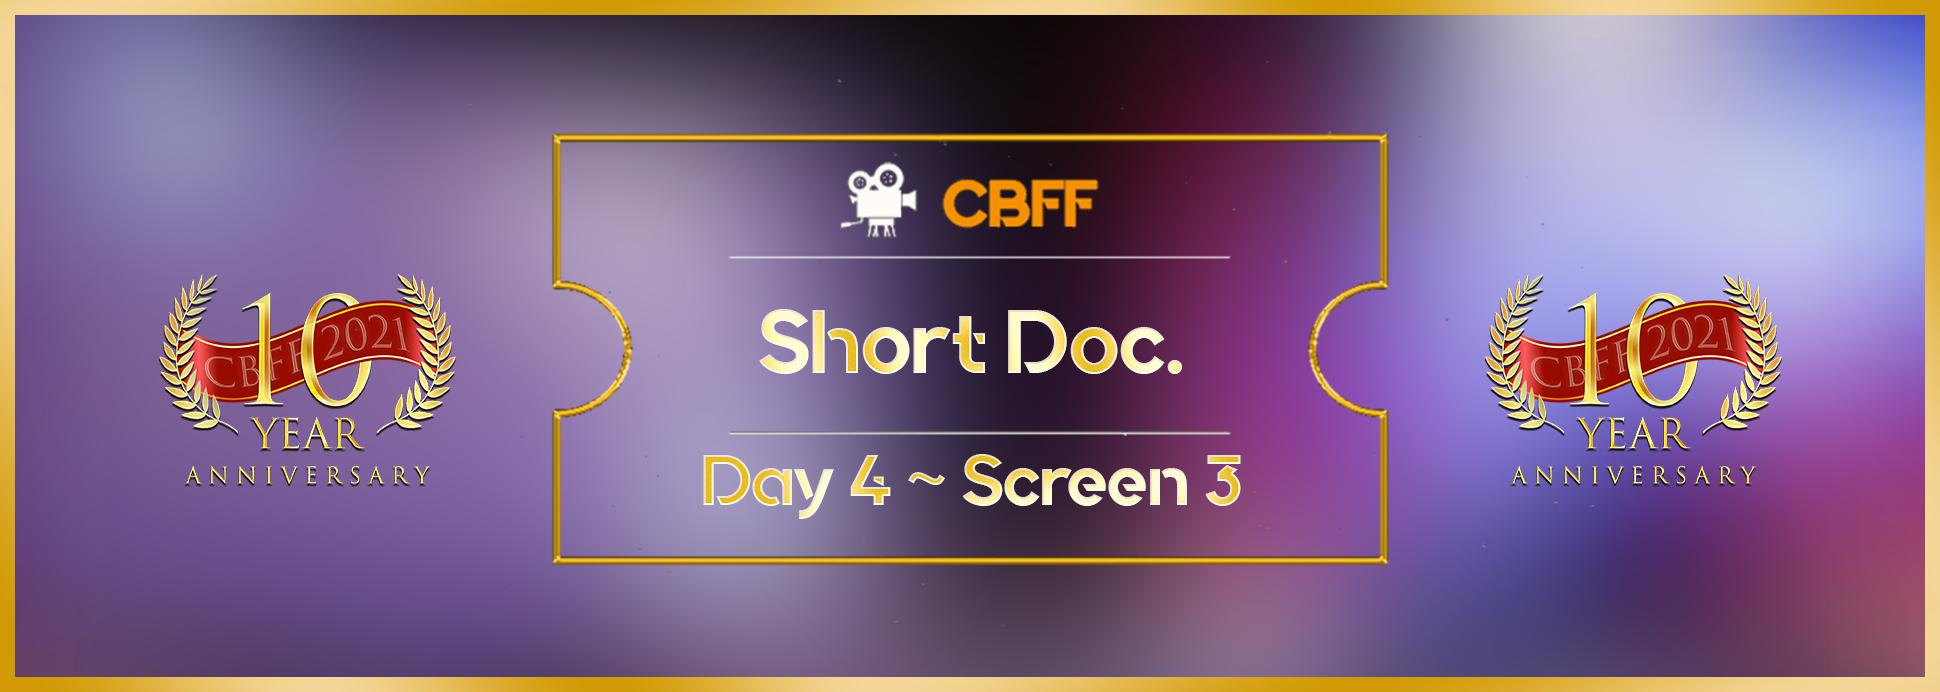 Day 4, Screen 3: Short Documentary